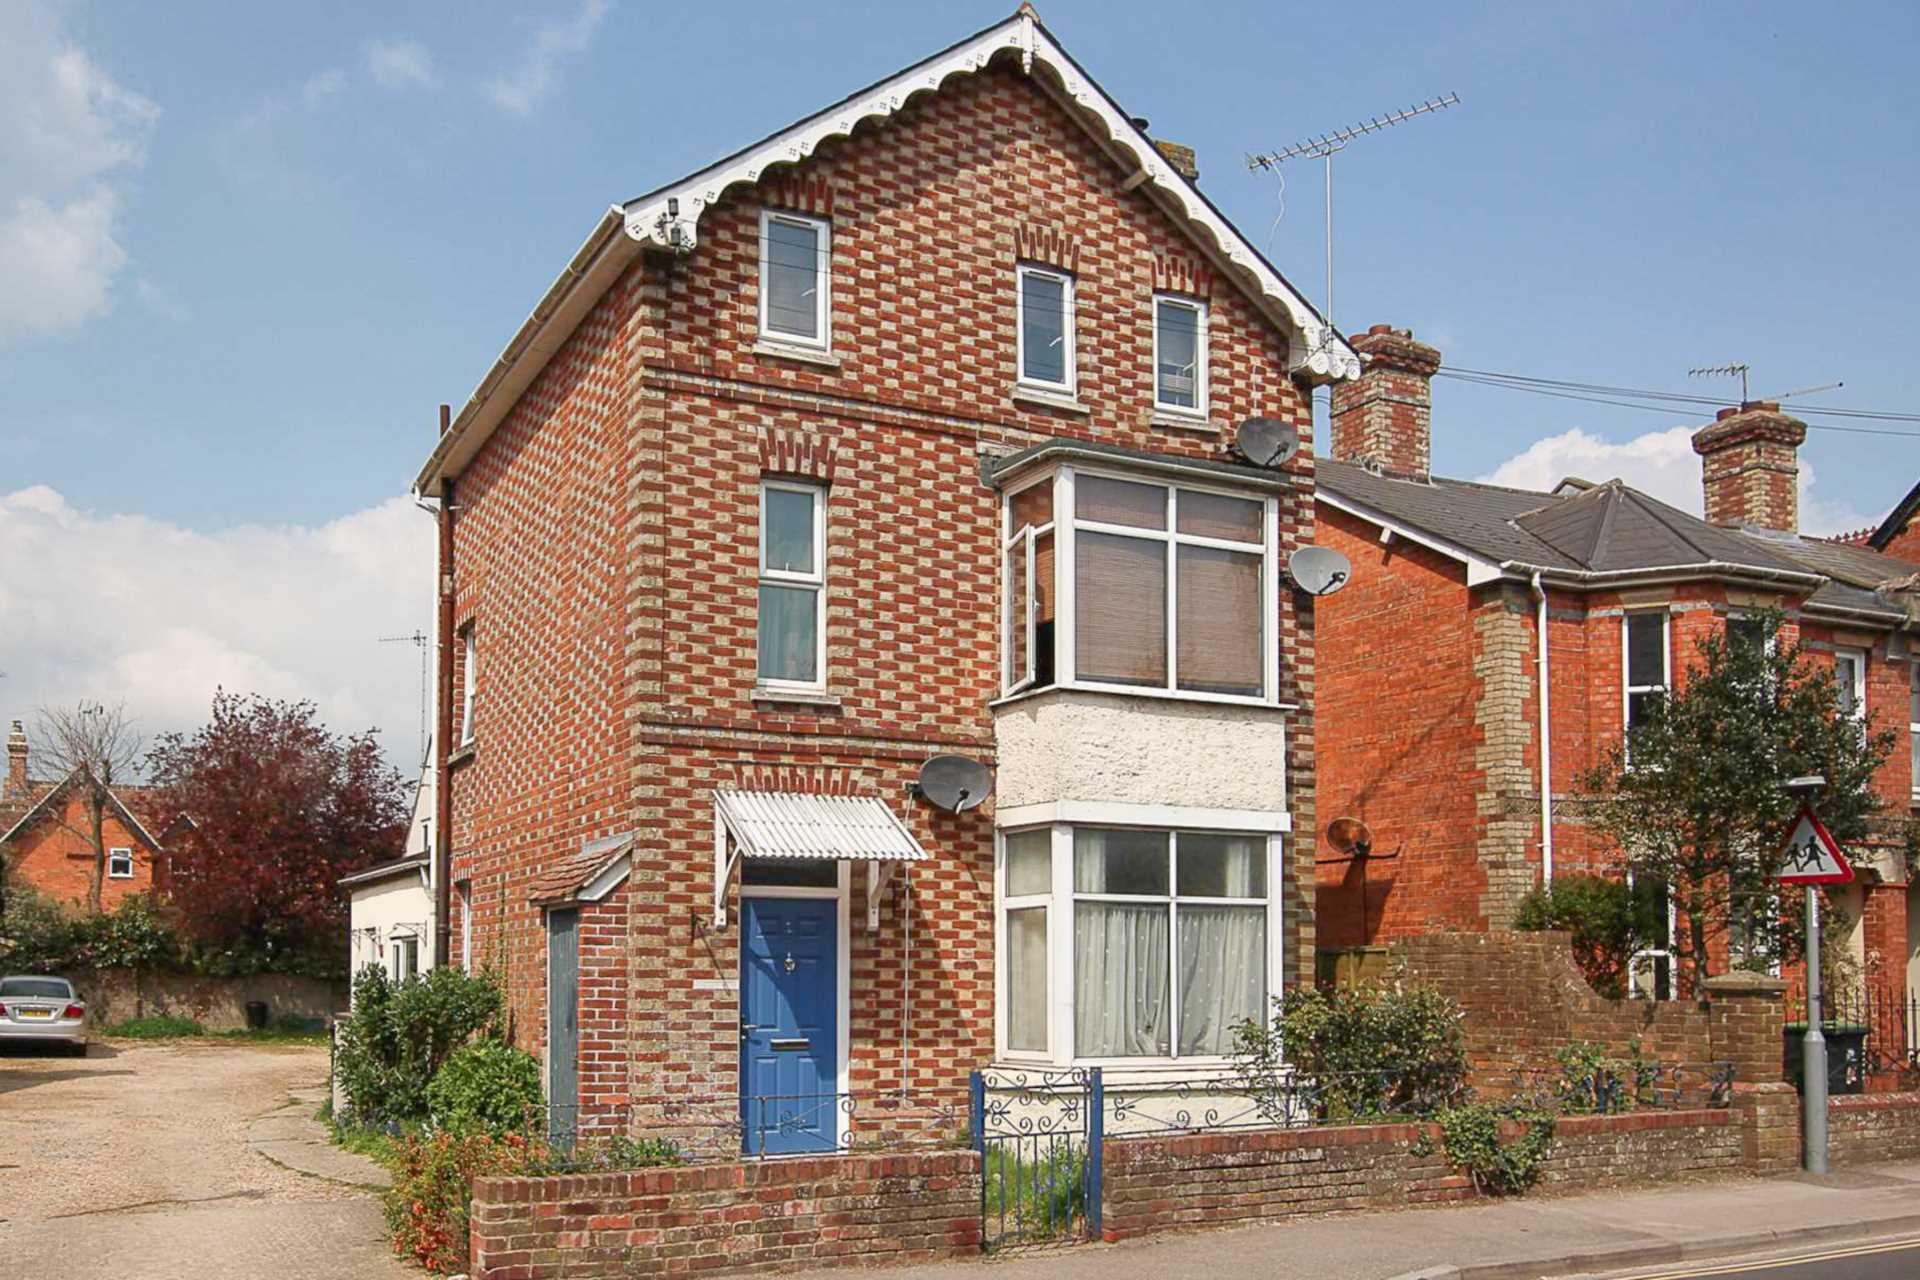 2 bed flat for sale in Salisbury Road, Blandford Forum, Blandford Forum - Property Image 1